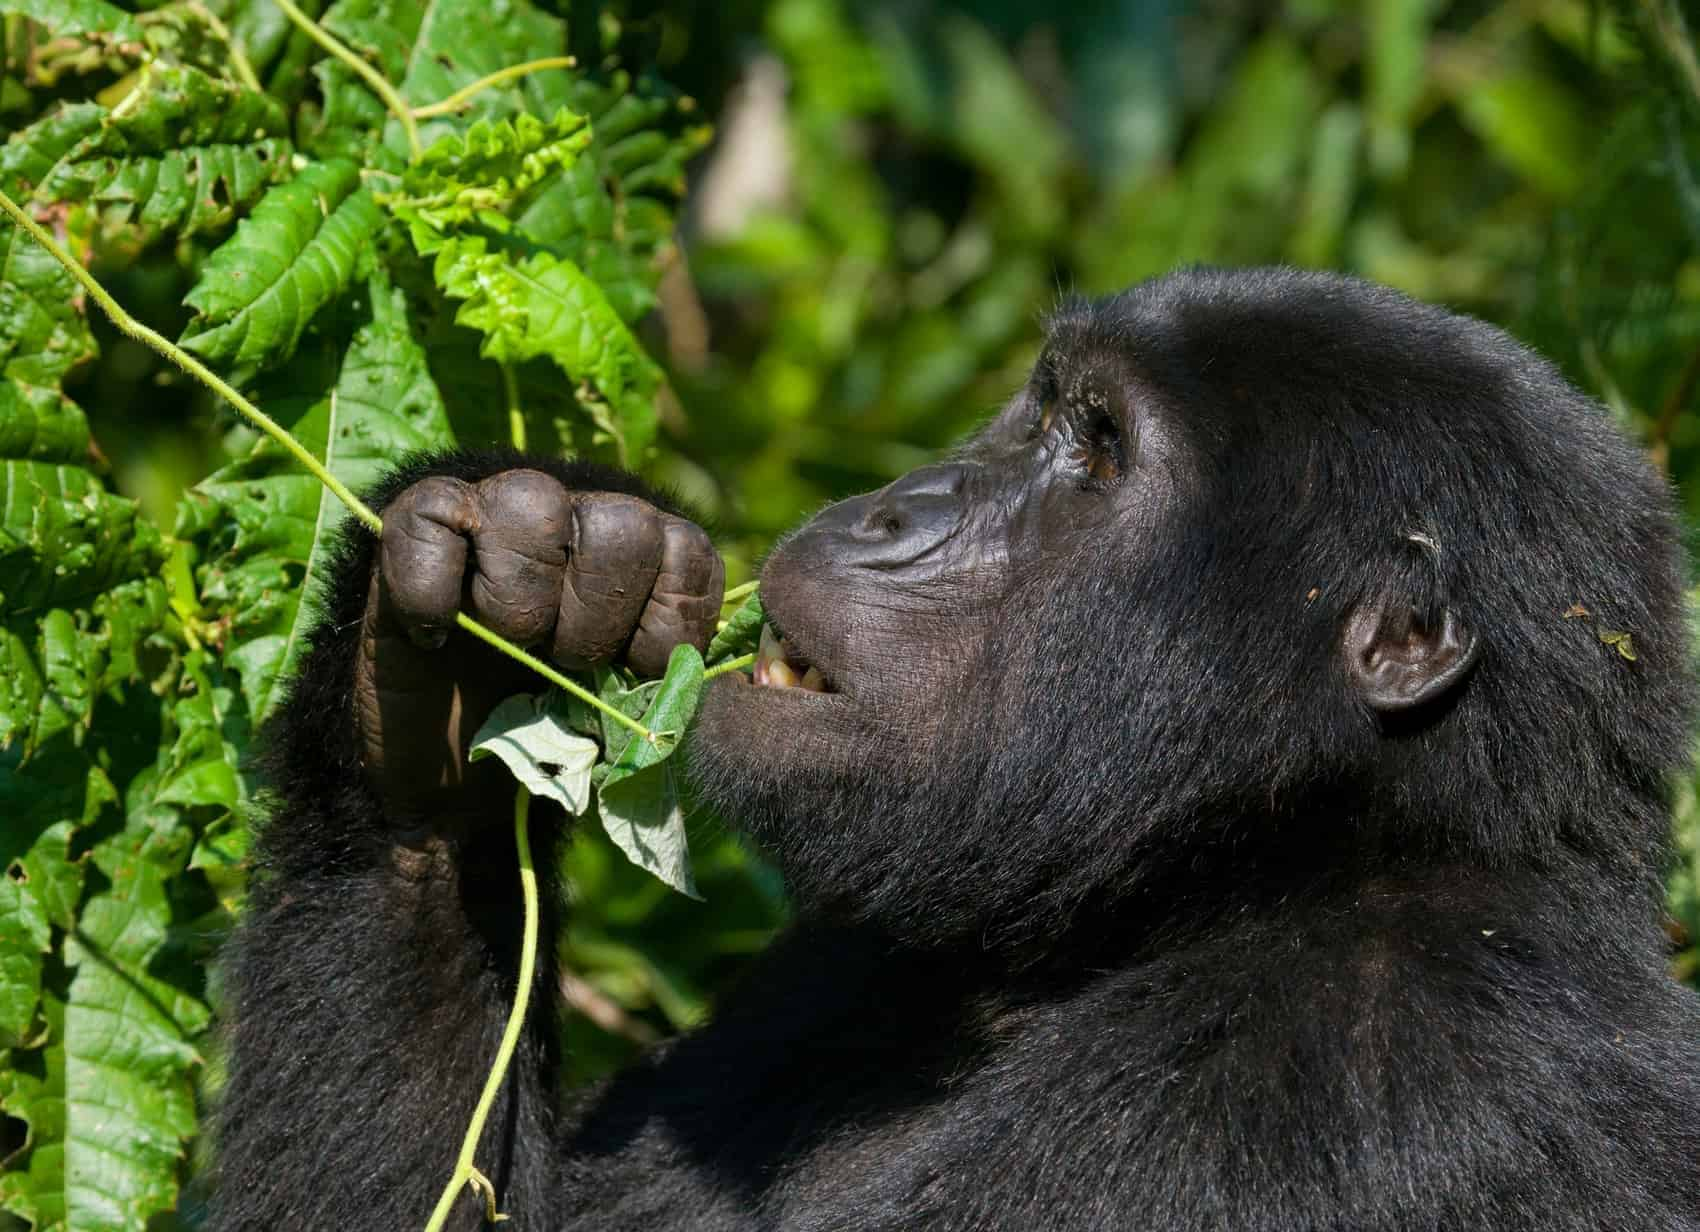 Mountain gorilla eating plants. Uganda. Bwindi Impenetrable Forest National Park. An excellent illustration.